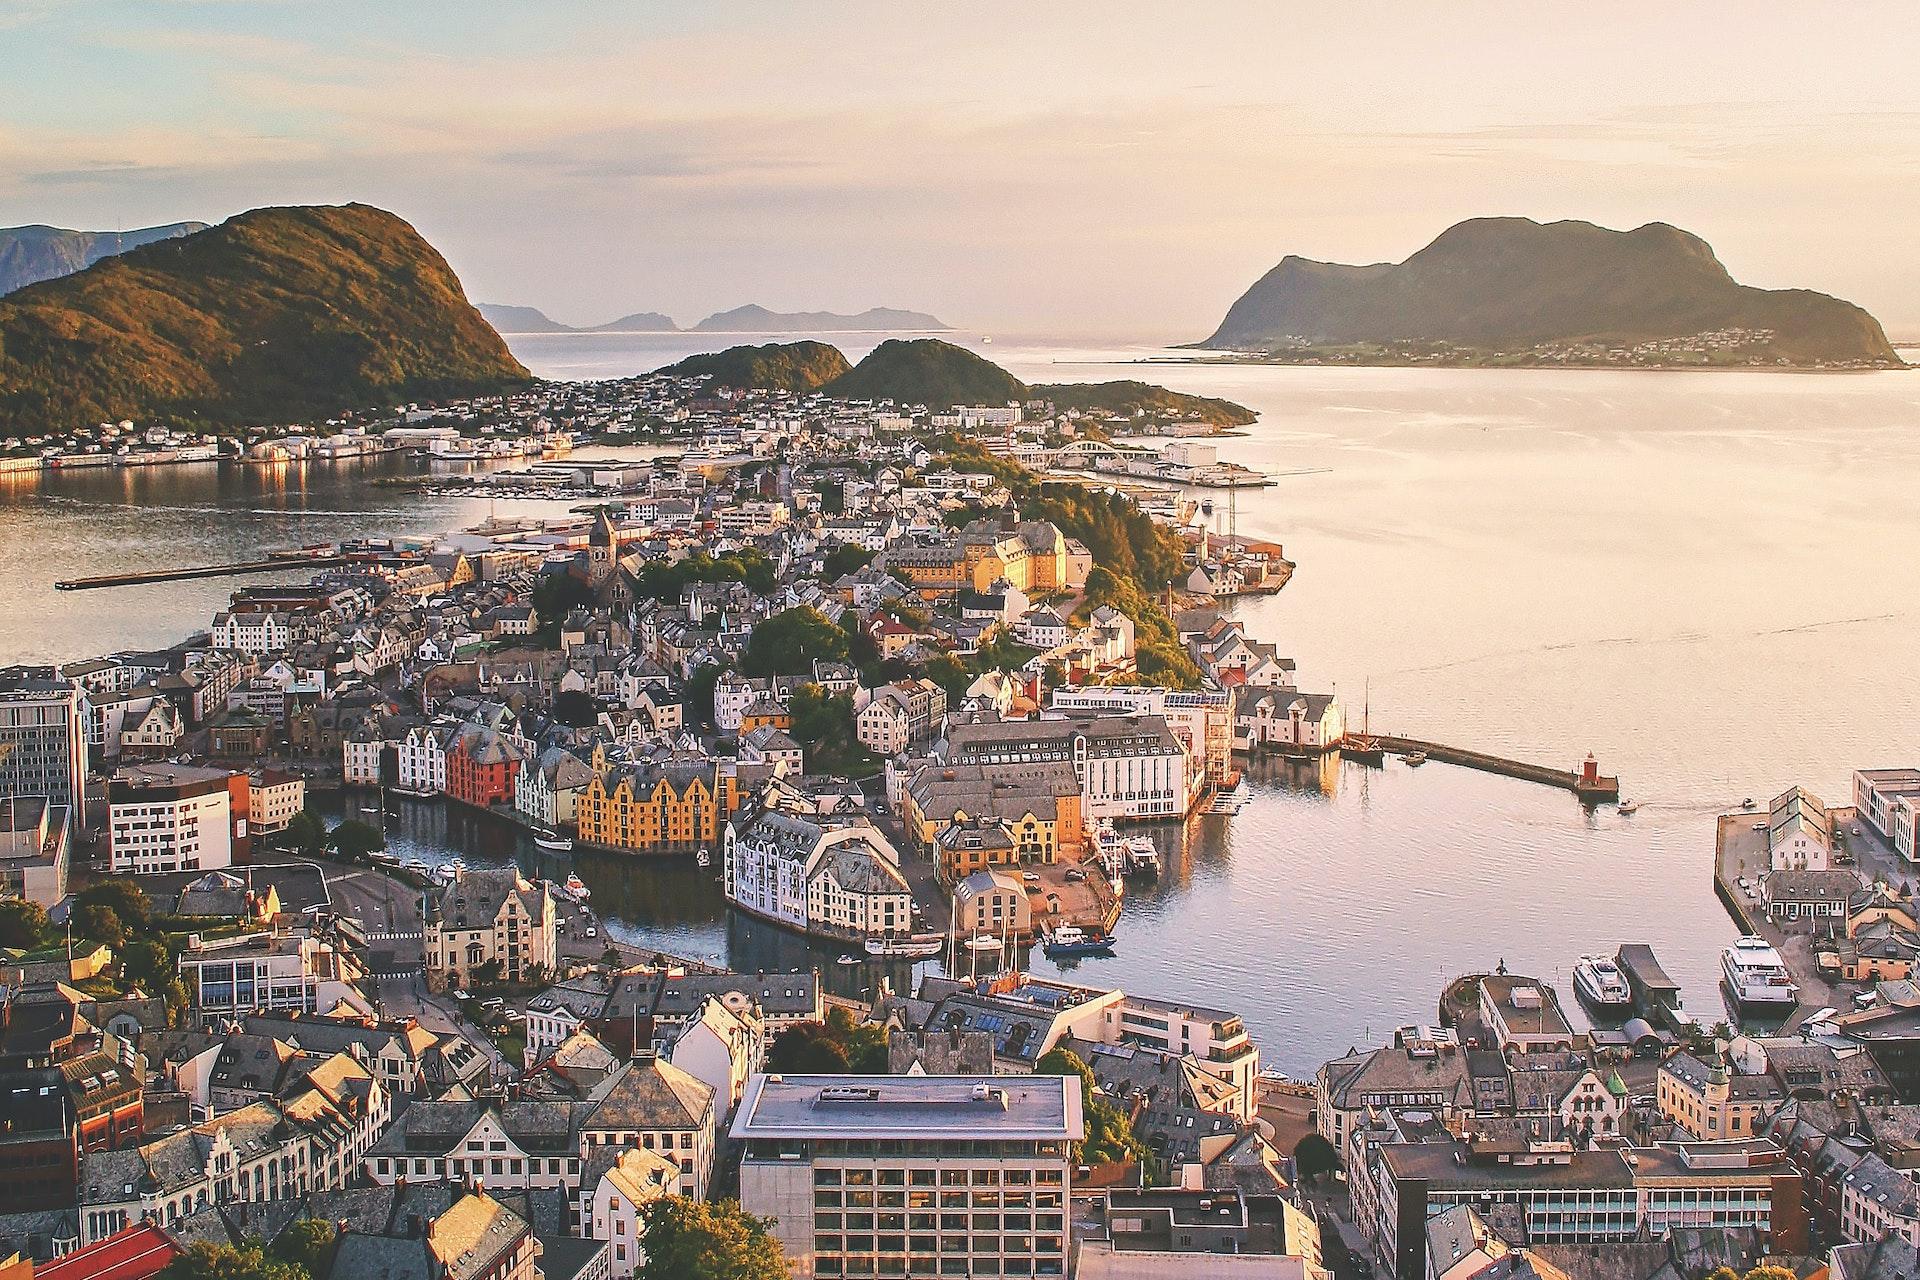 Photo: Aksla Viewpoint, Alesund, Norway | Credit: Jarand K. Løkeland, YFS Magazine, Unsplash